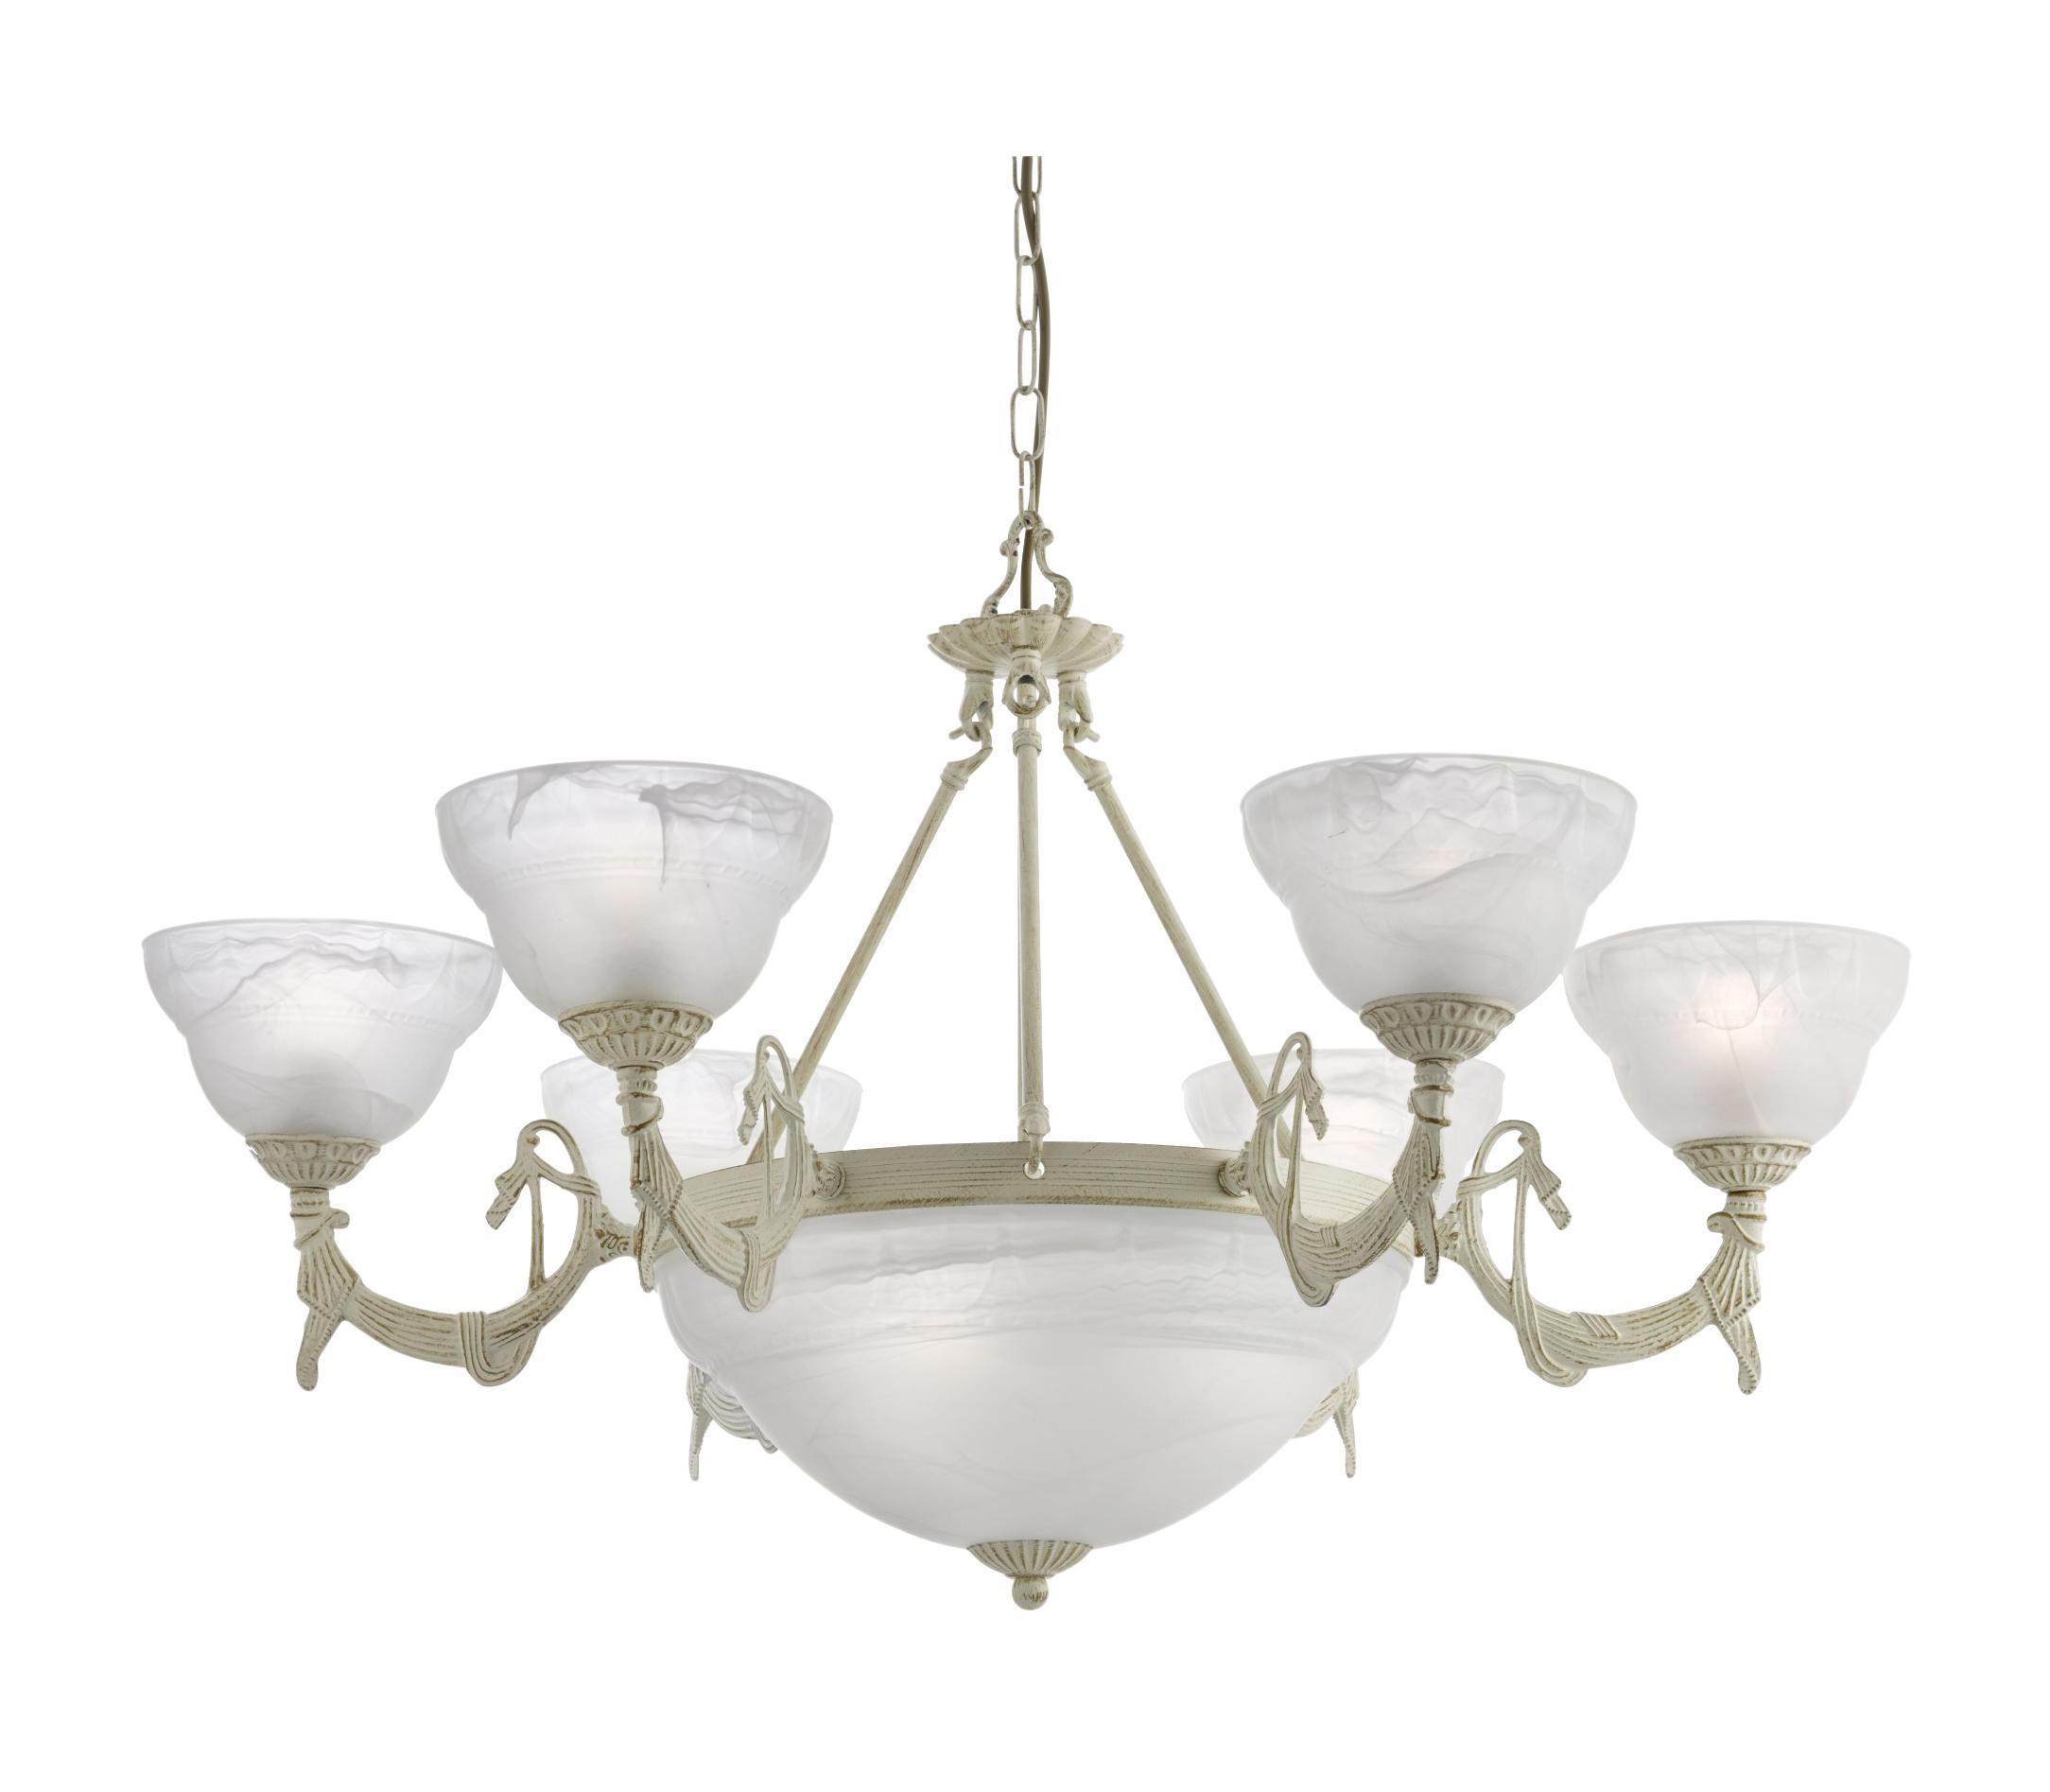 Люстра Arte lamp A8777lm-6-3wg люстра divinare diana 8111 01 lm 6